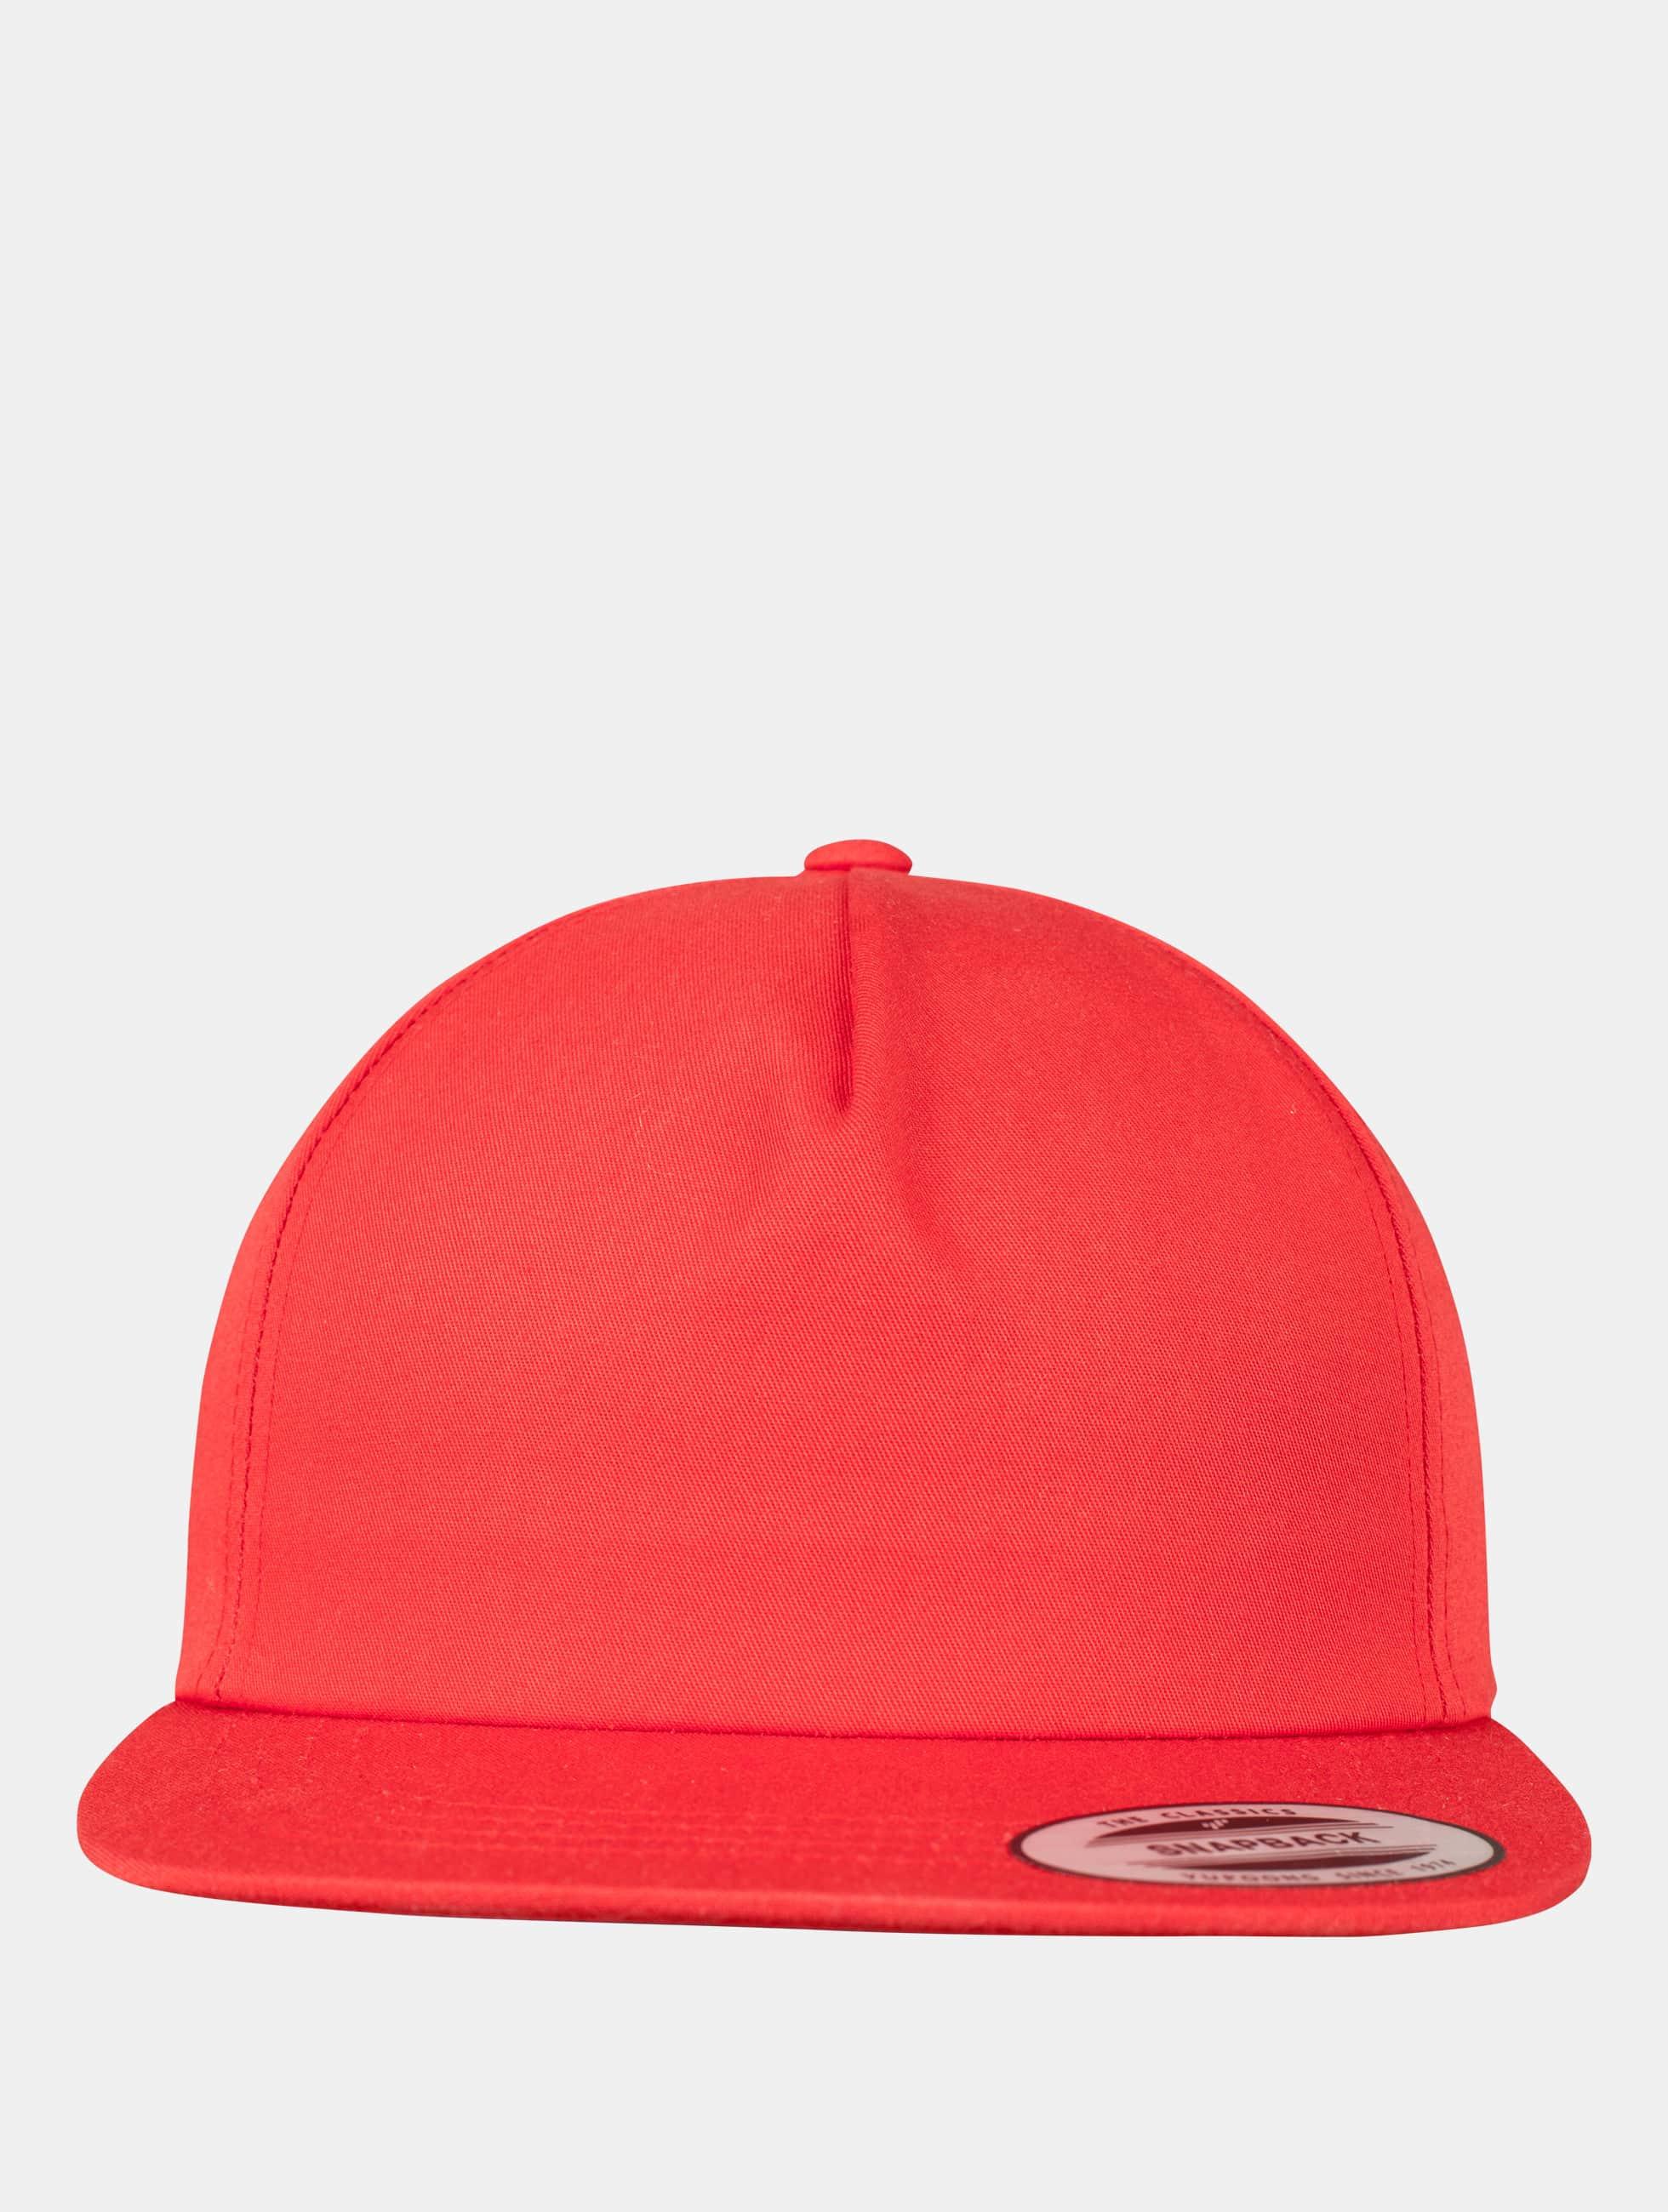 Flexfit Casquette Snapback & Strapback Unstructured rouge